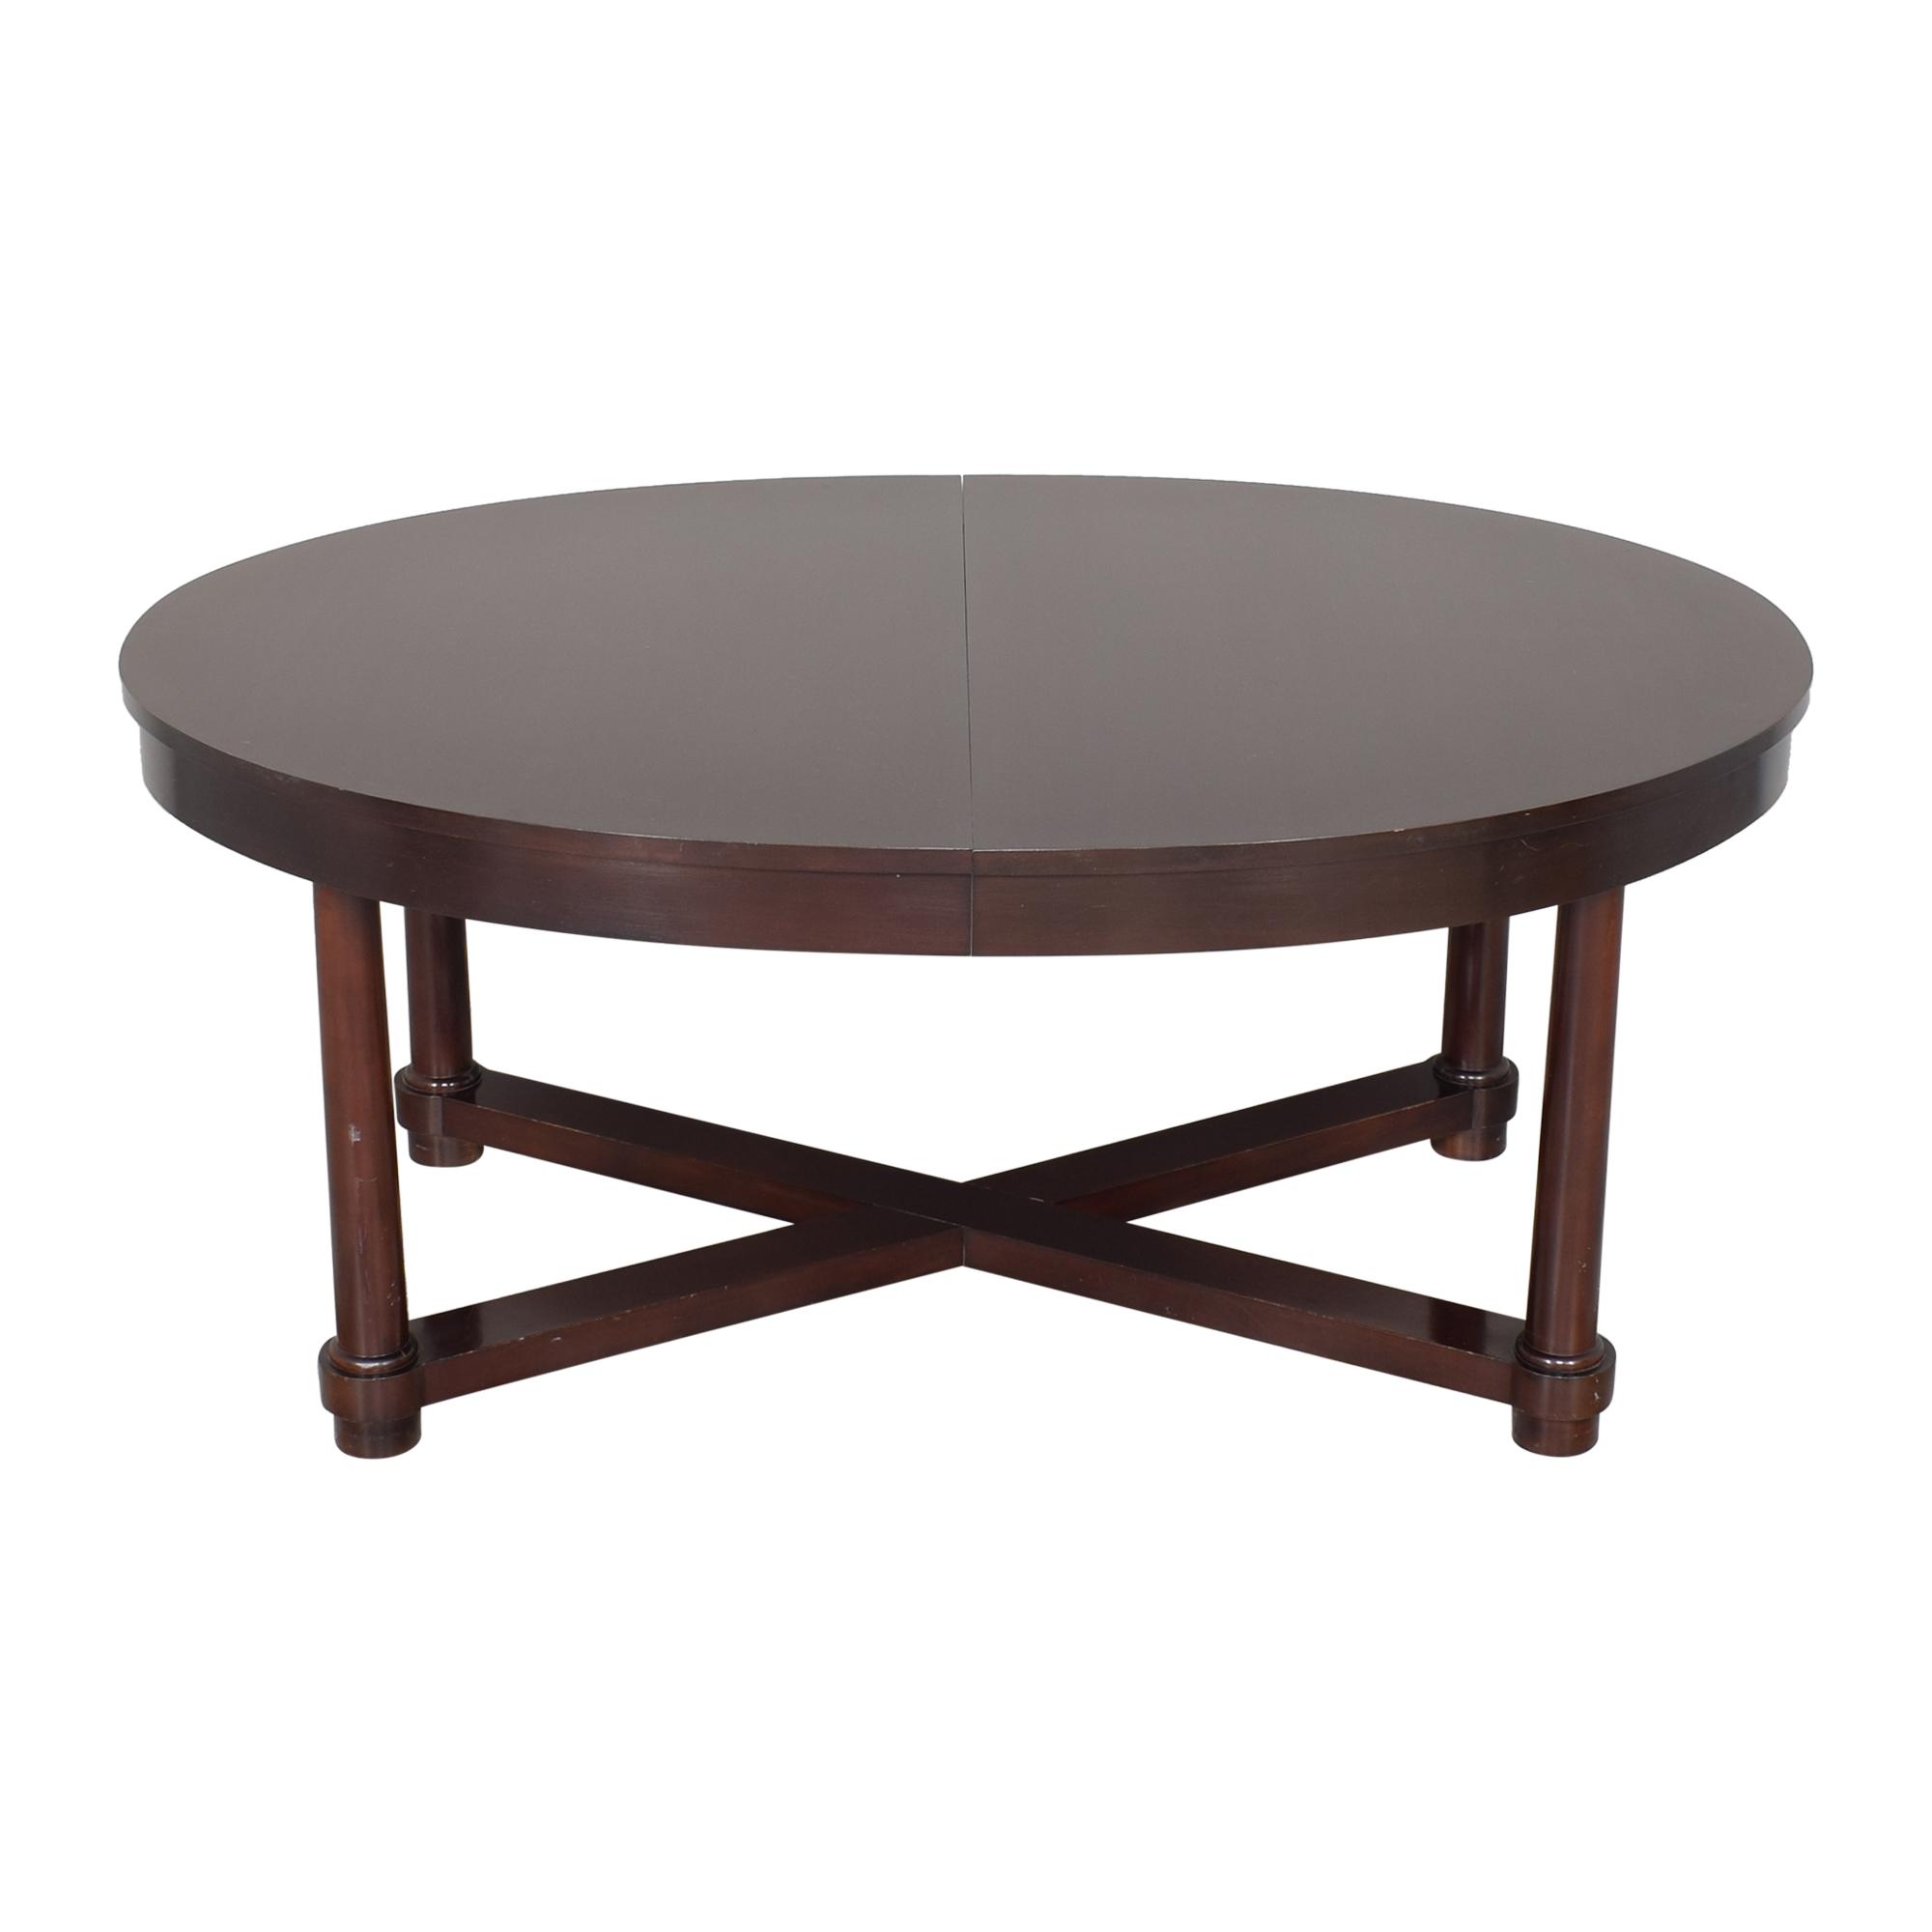 buy Baker Furniture Barbara Barry Extendable Dining Table Baker Furniture Dinner Tables